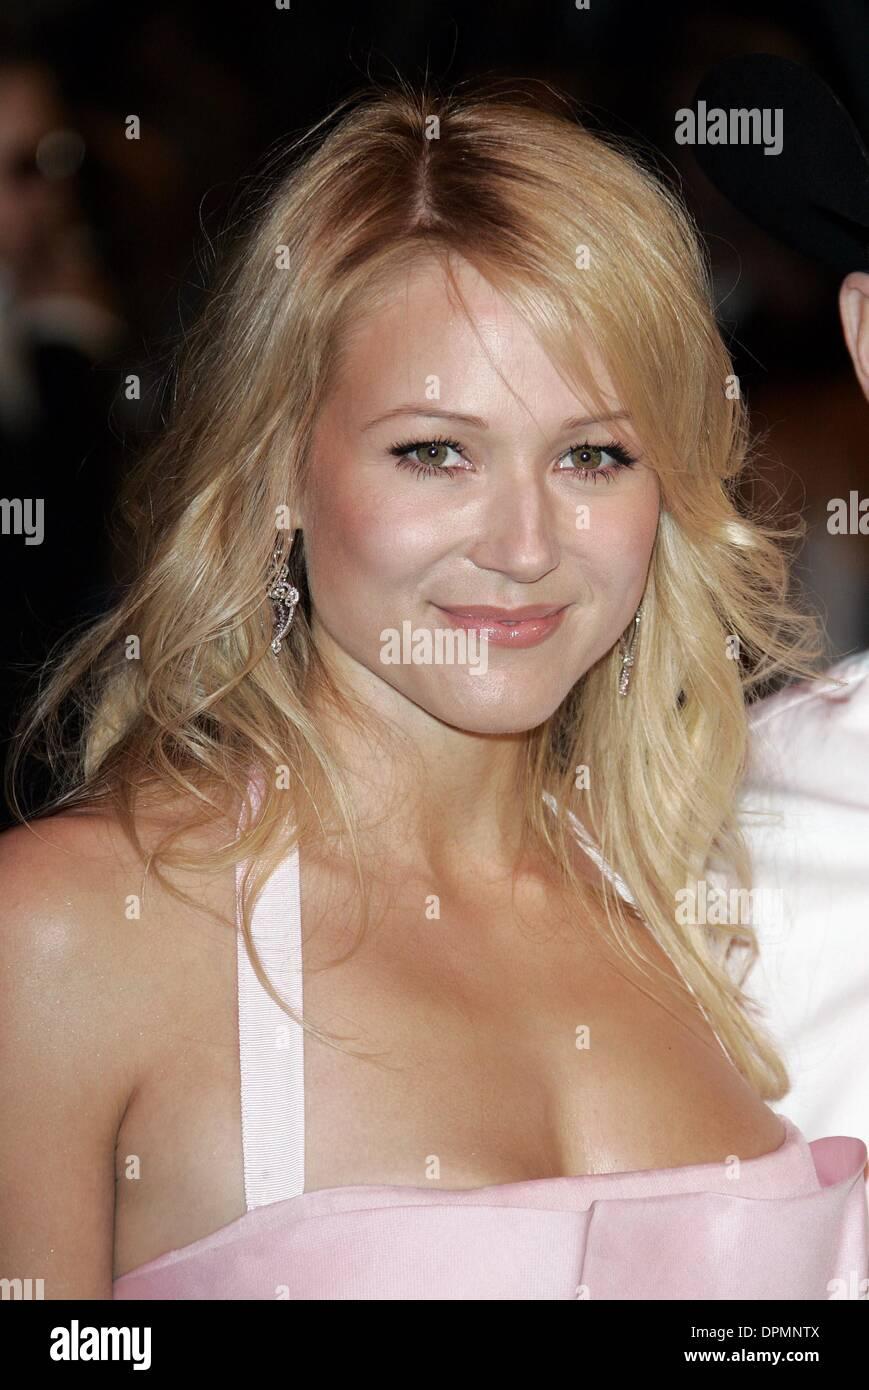 Mar. 28, 2006 - West Hollywood, LOS ANGELES, USA - JEWEL.SINGER.VANITY FAIR PARTY 2006.MORTONS, WEST HOLLYWOOD, LOS ANGELES, USA.LAQ66171.K47133.03-05-2006.(Credit Image: © Globe Photos/ZUMAPRESS.com) - Stock Image